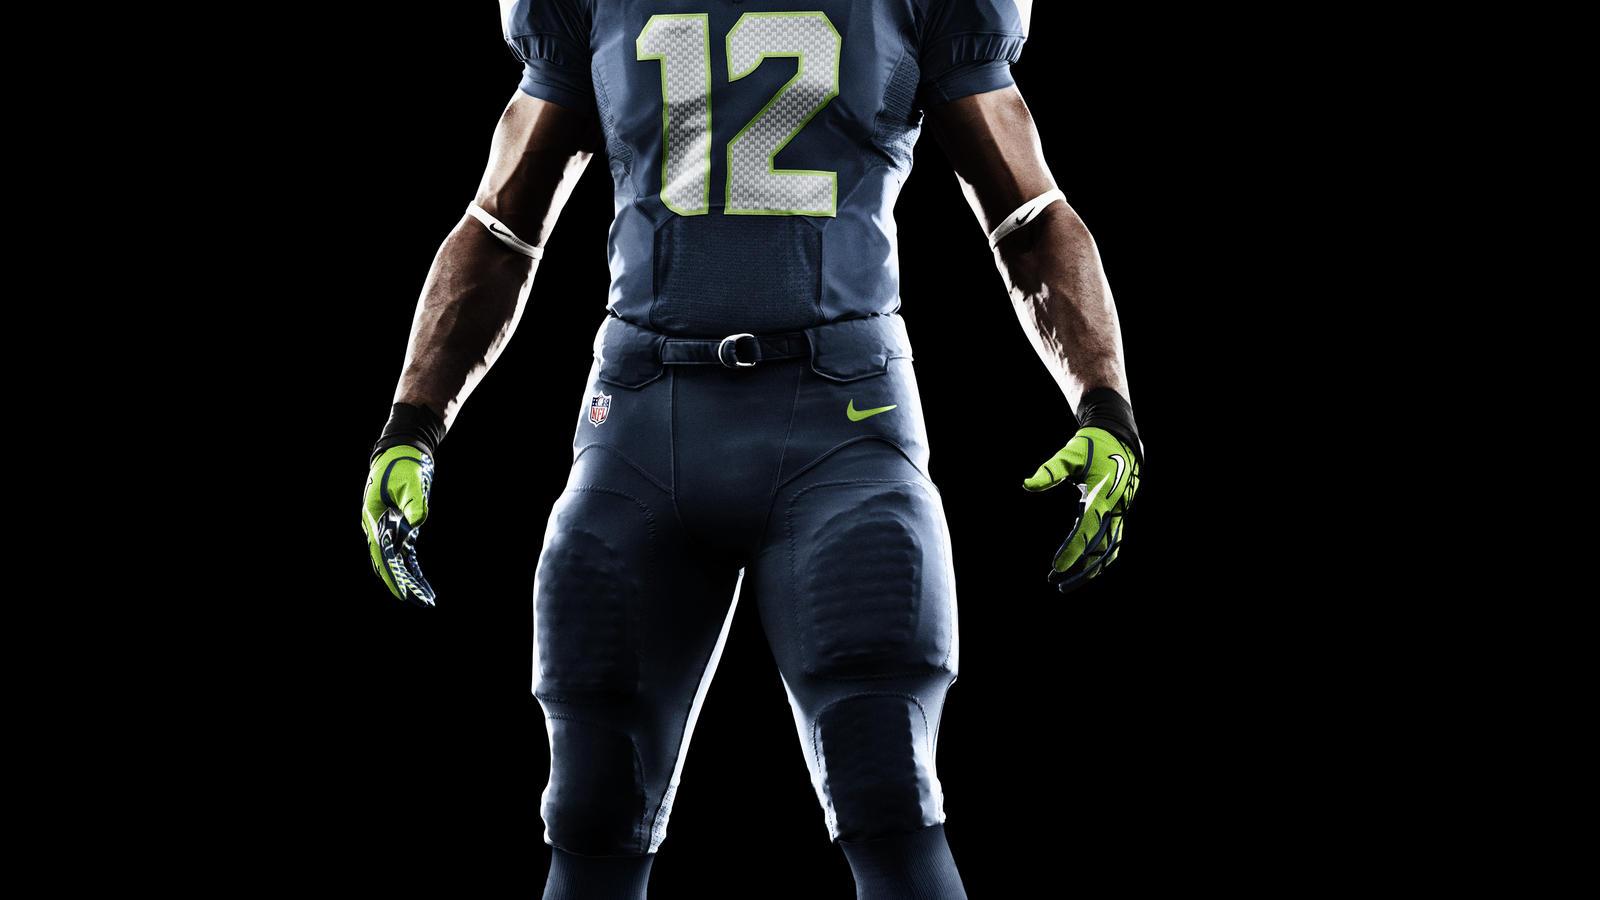 best website f90b0 c4304 Seattle Seahawks 2012 Nike Football Uniform - Nike News